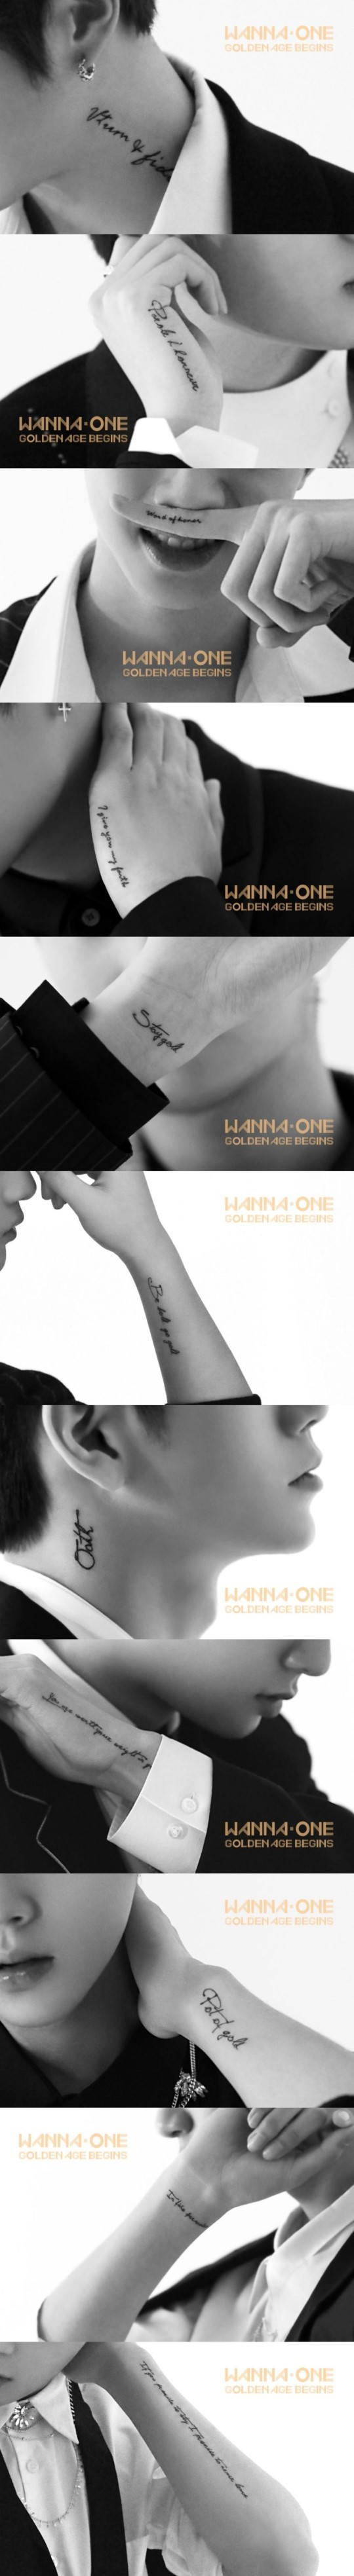 Photo from Wanna One social media account.